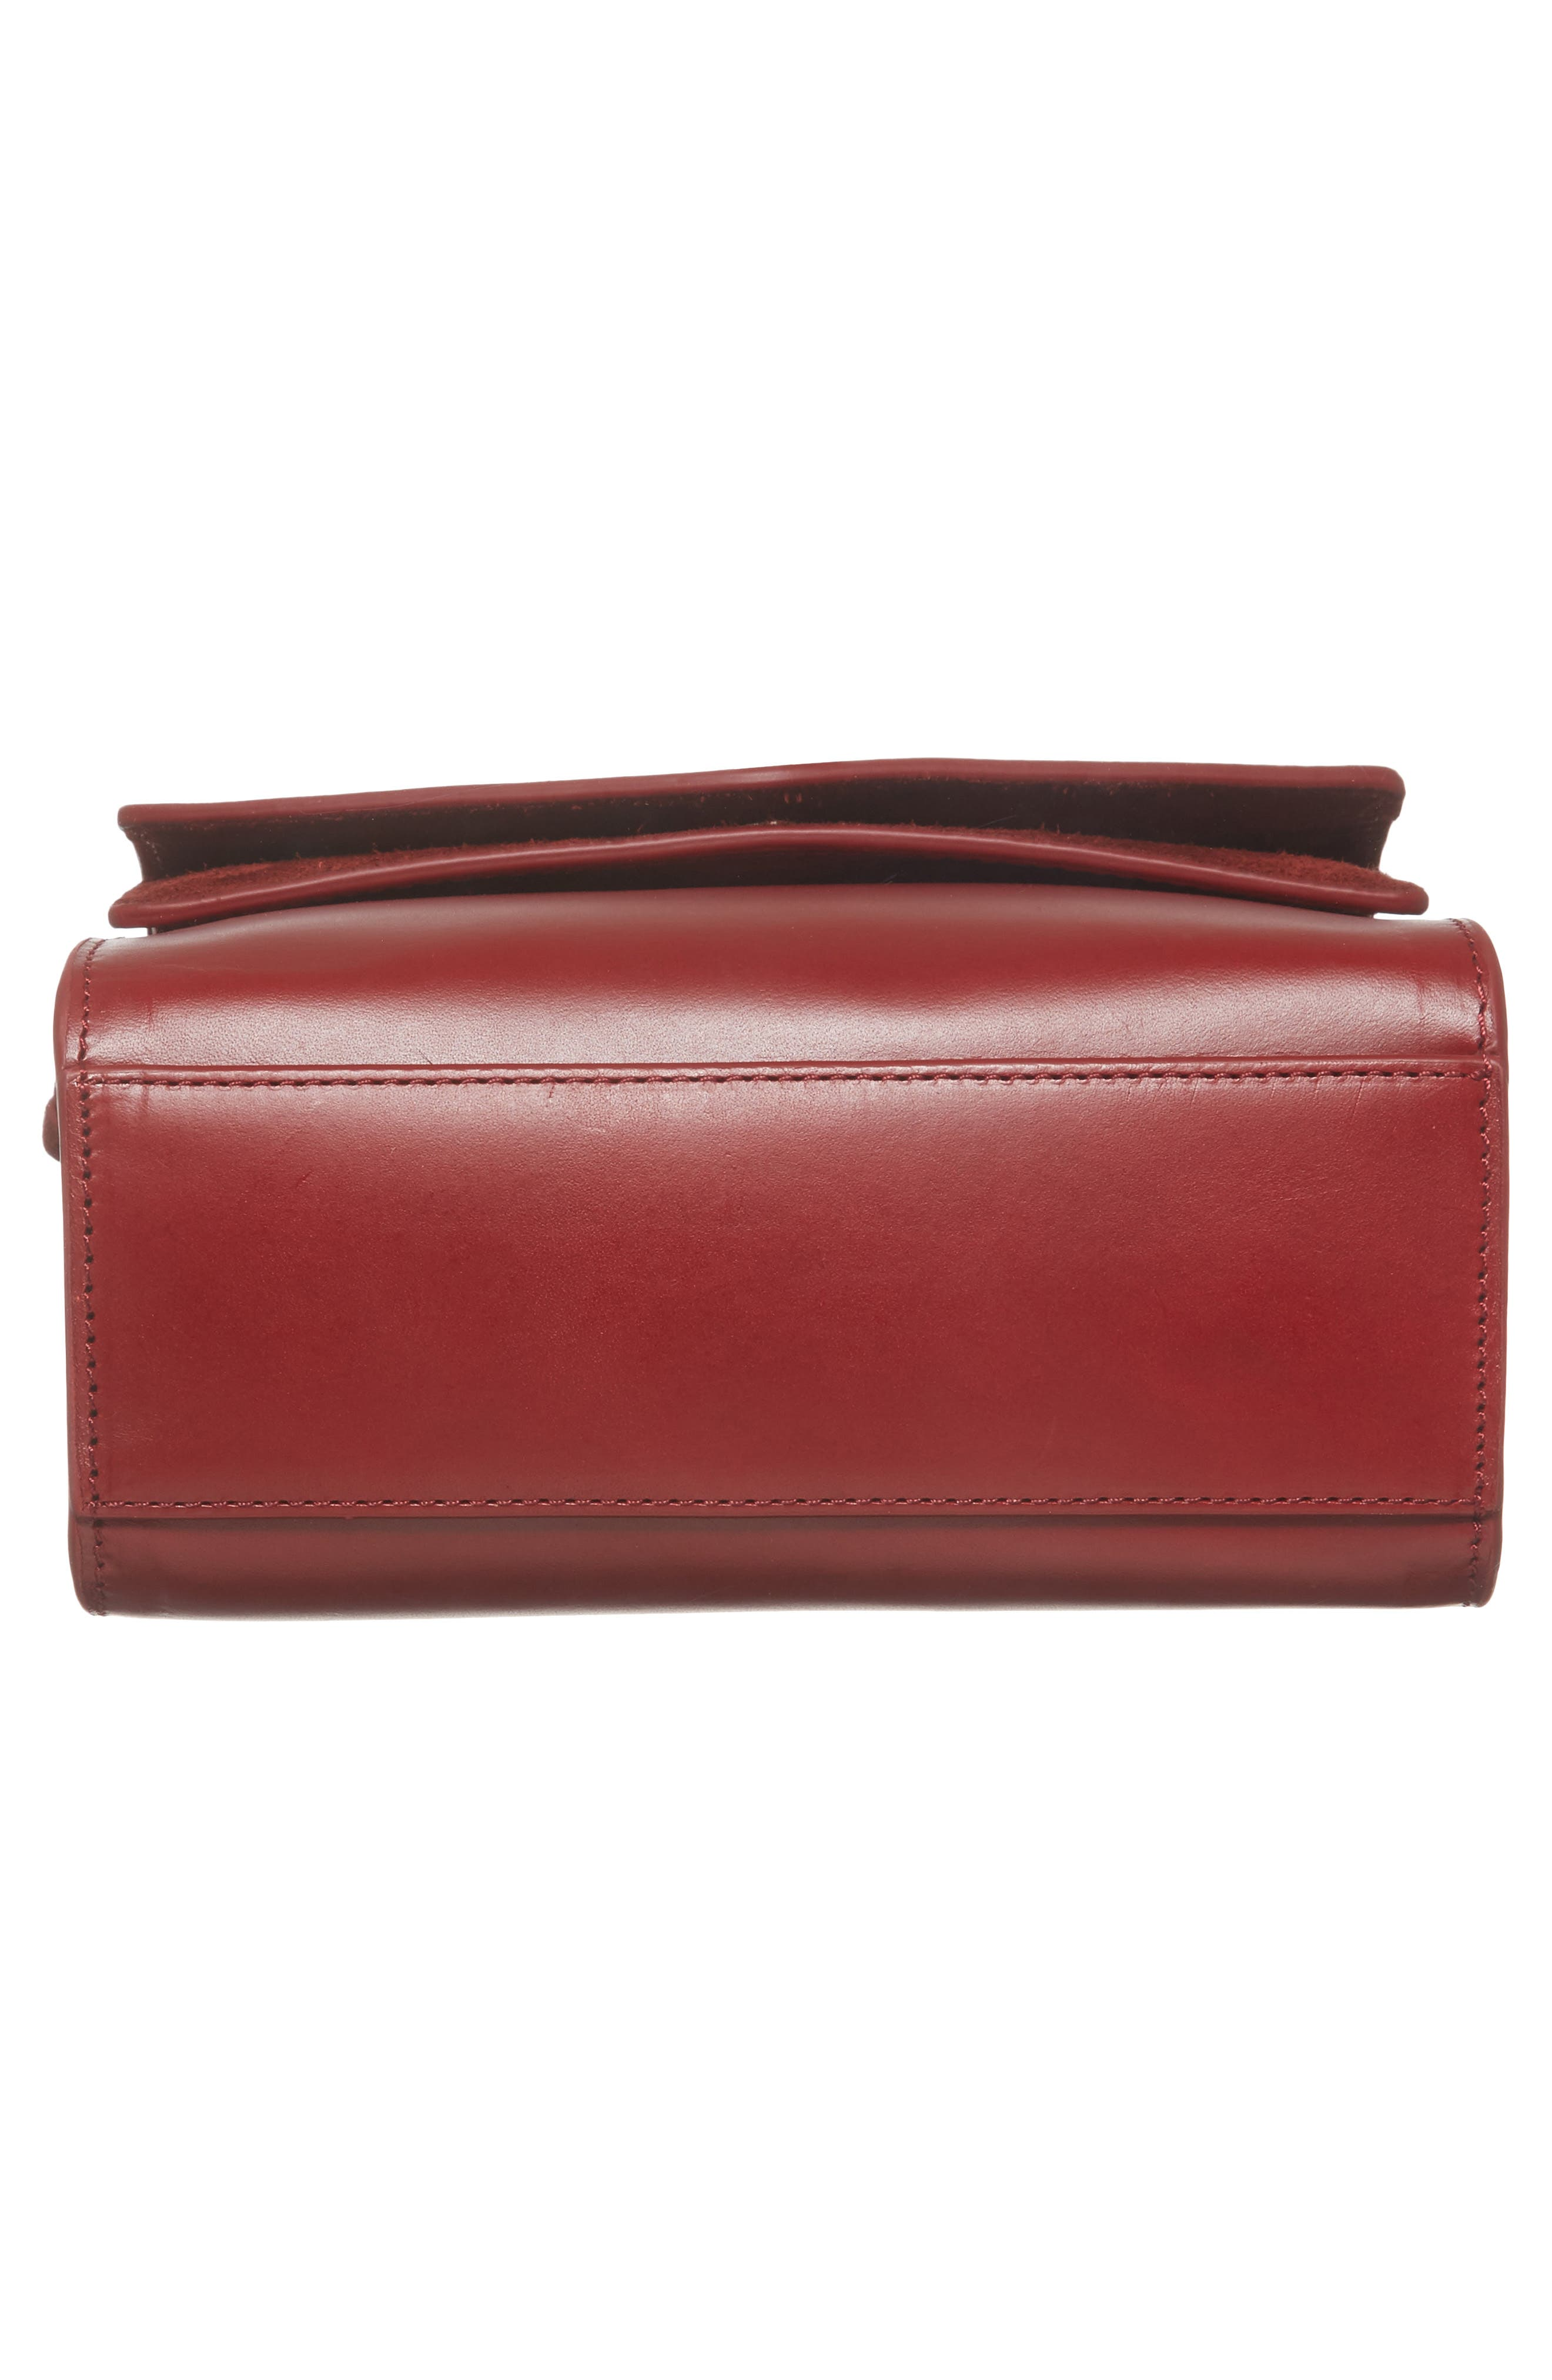 Eloise Field Crossbody Bag,                             Alternate thumbnail 6, color,                             612